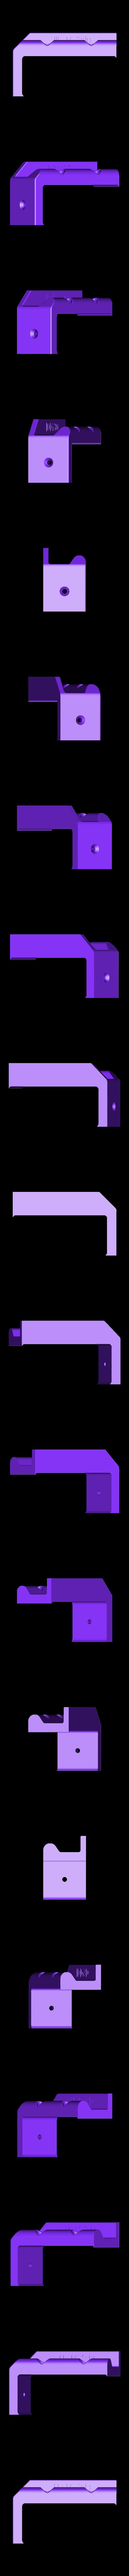 grinder_cutoff_-_2020_guide.stl Download free STL file Angle Grinder Chop Saw for EMT Conduit and 2020 Extrusion • 3D printer design, idig3d